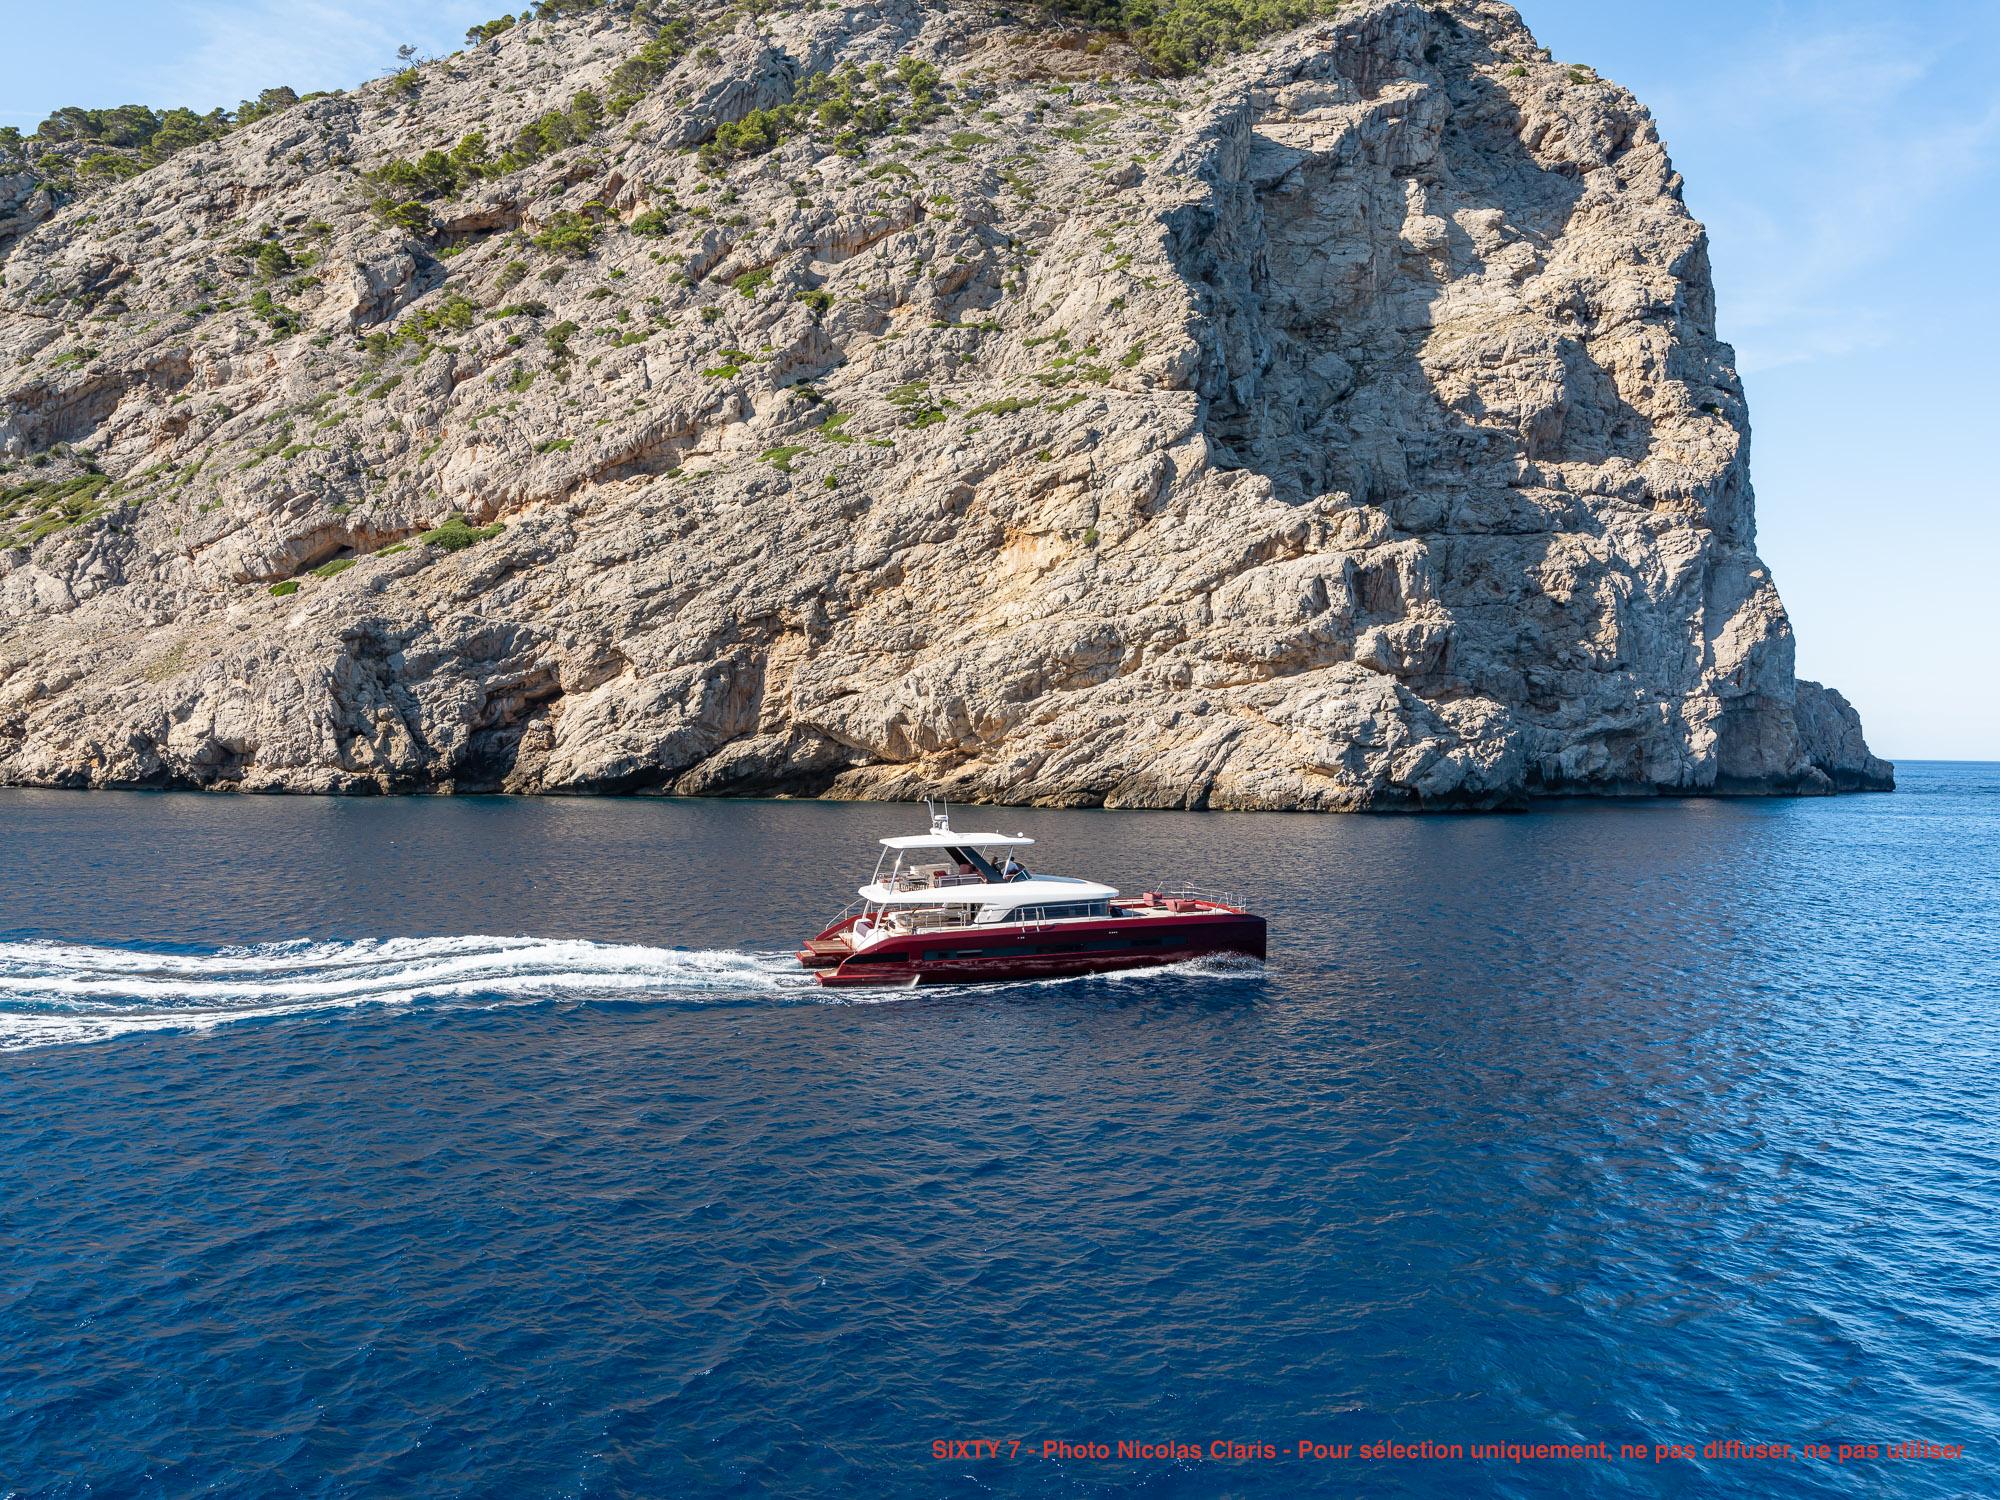 SIXTY 7 catamaran